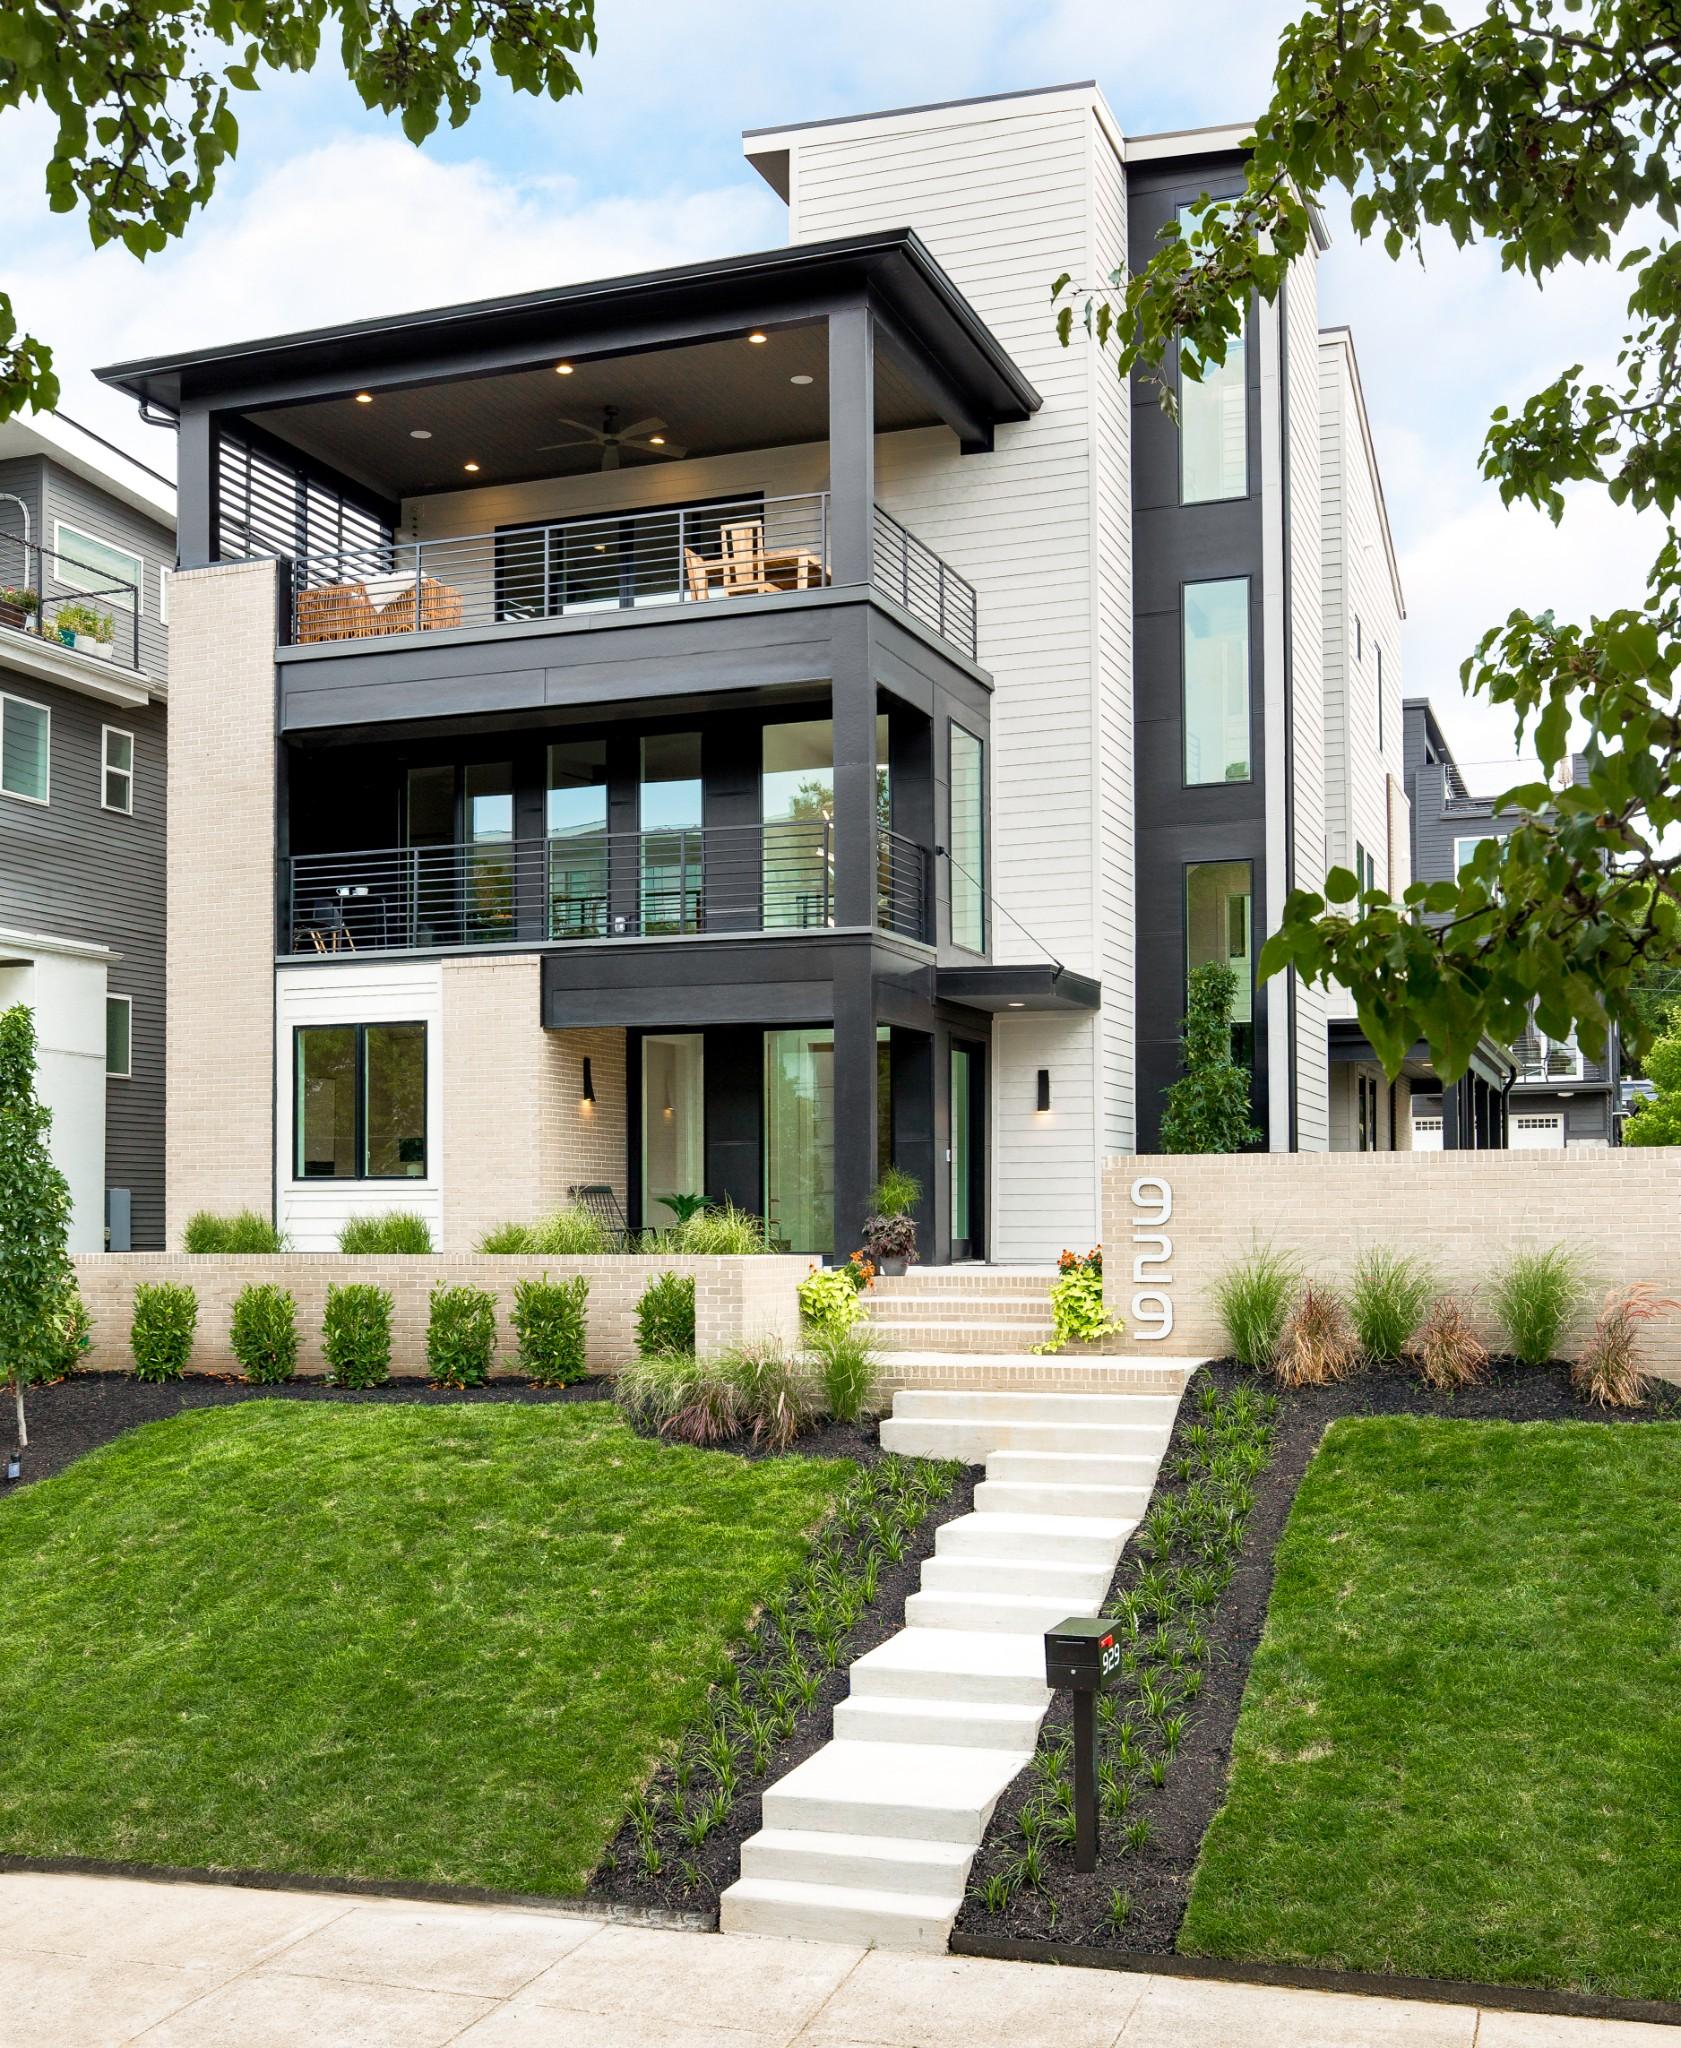 929 South St Property Photo - Nashville, TN real estate listing